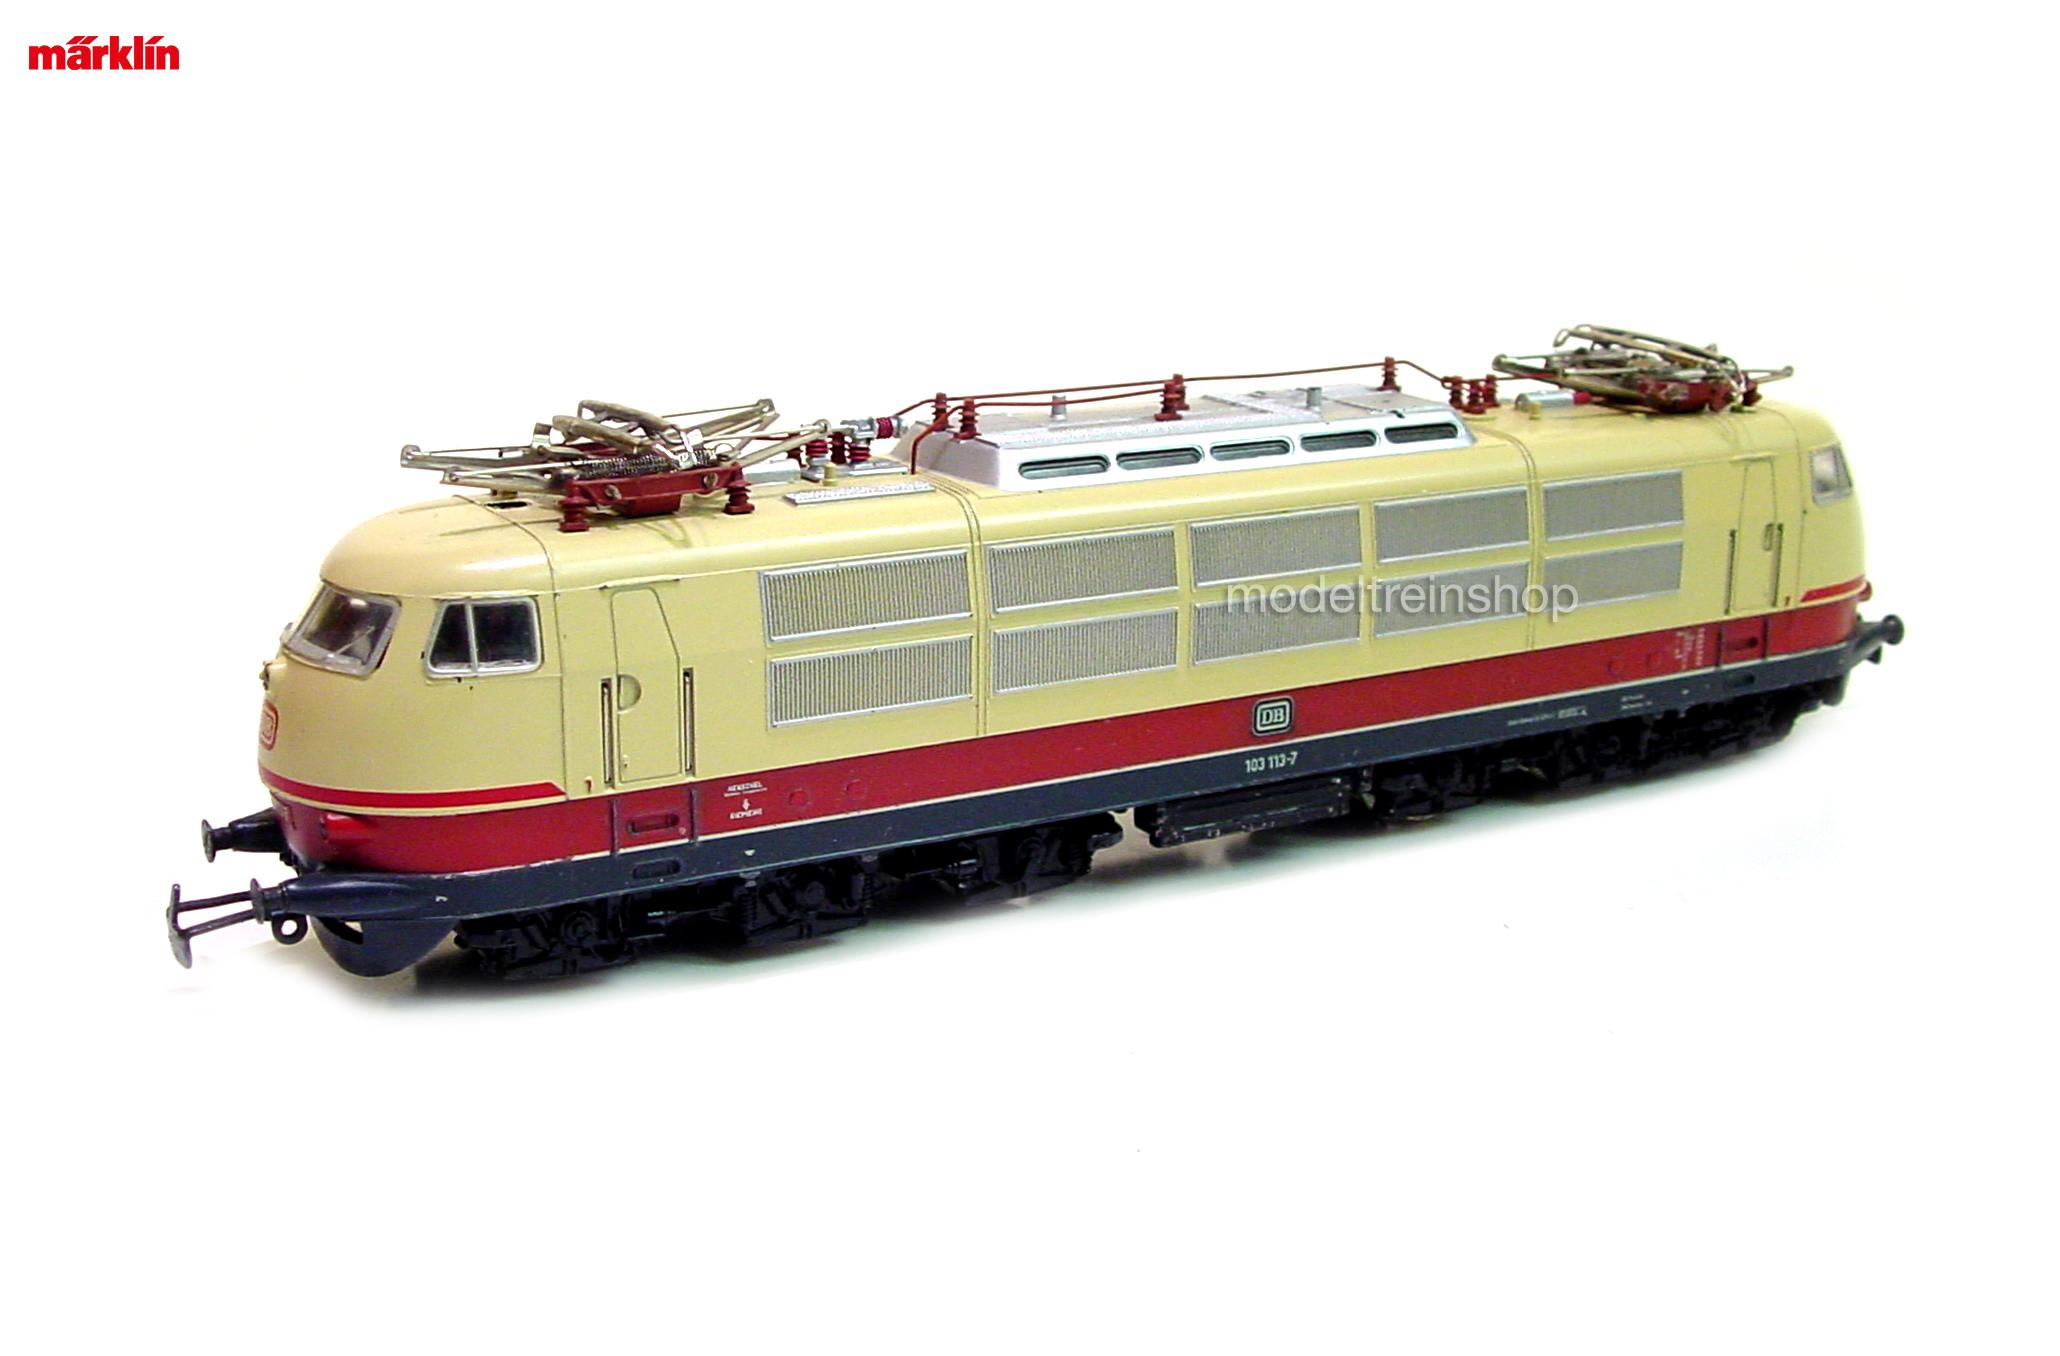 Marklin H0 3053 V4 Electrische Locomotief BR E 03 / BR 103 - Modeltreinshop